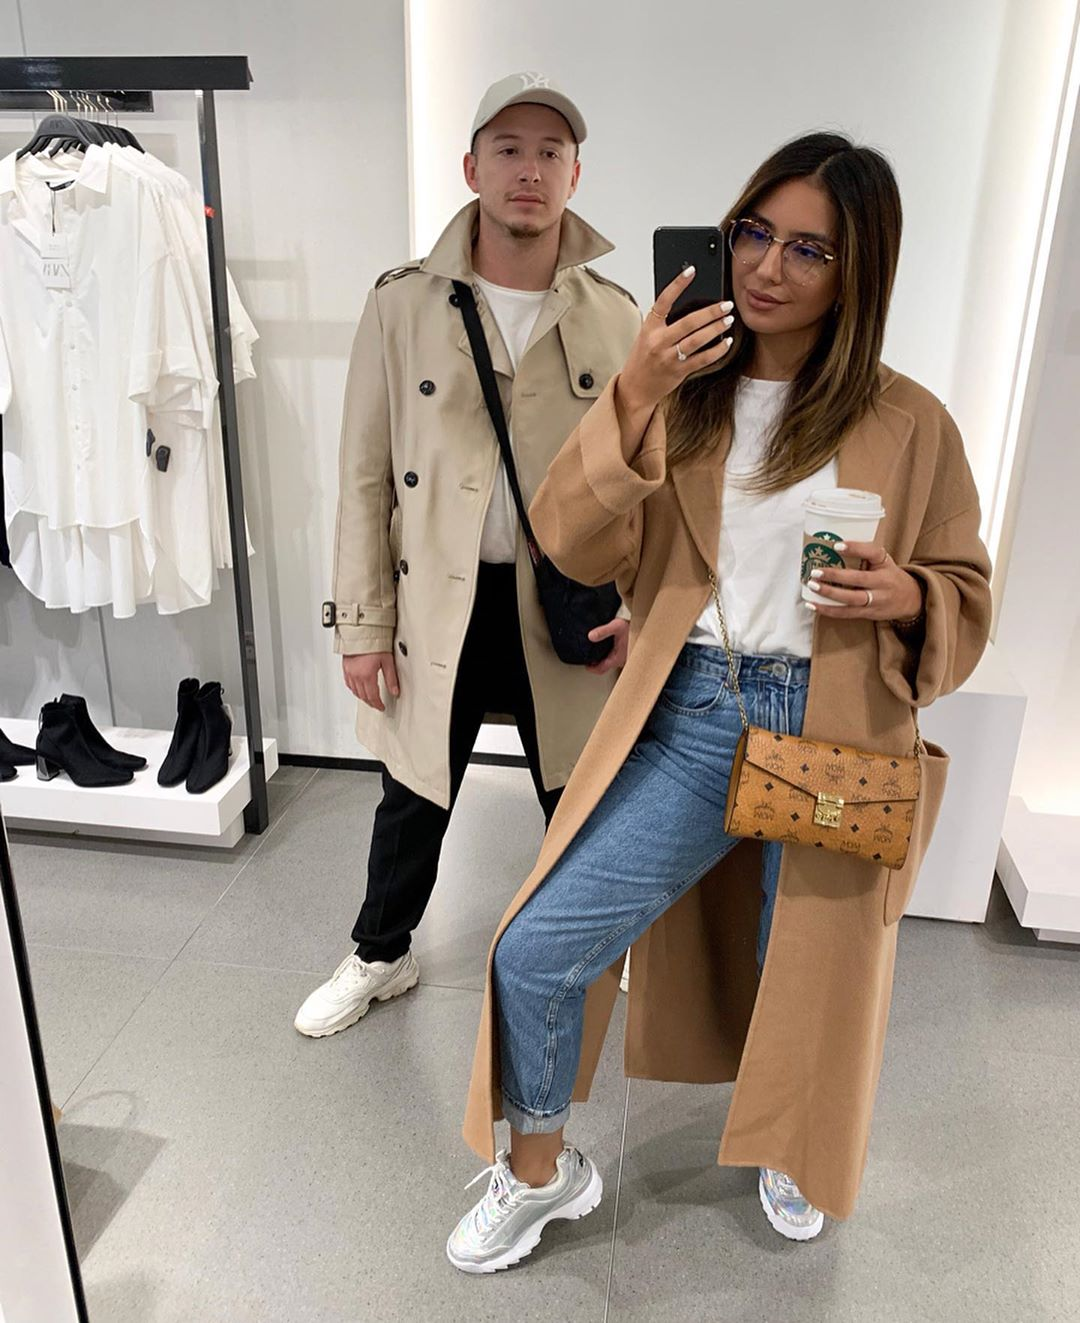 coat with pockets and belt de Zara sur gigirella_